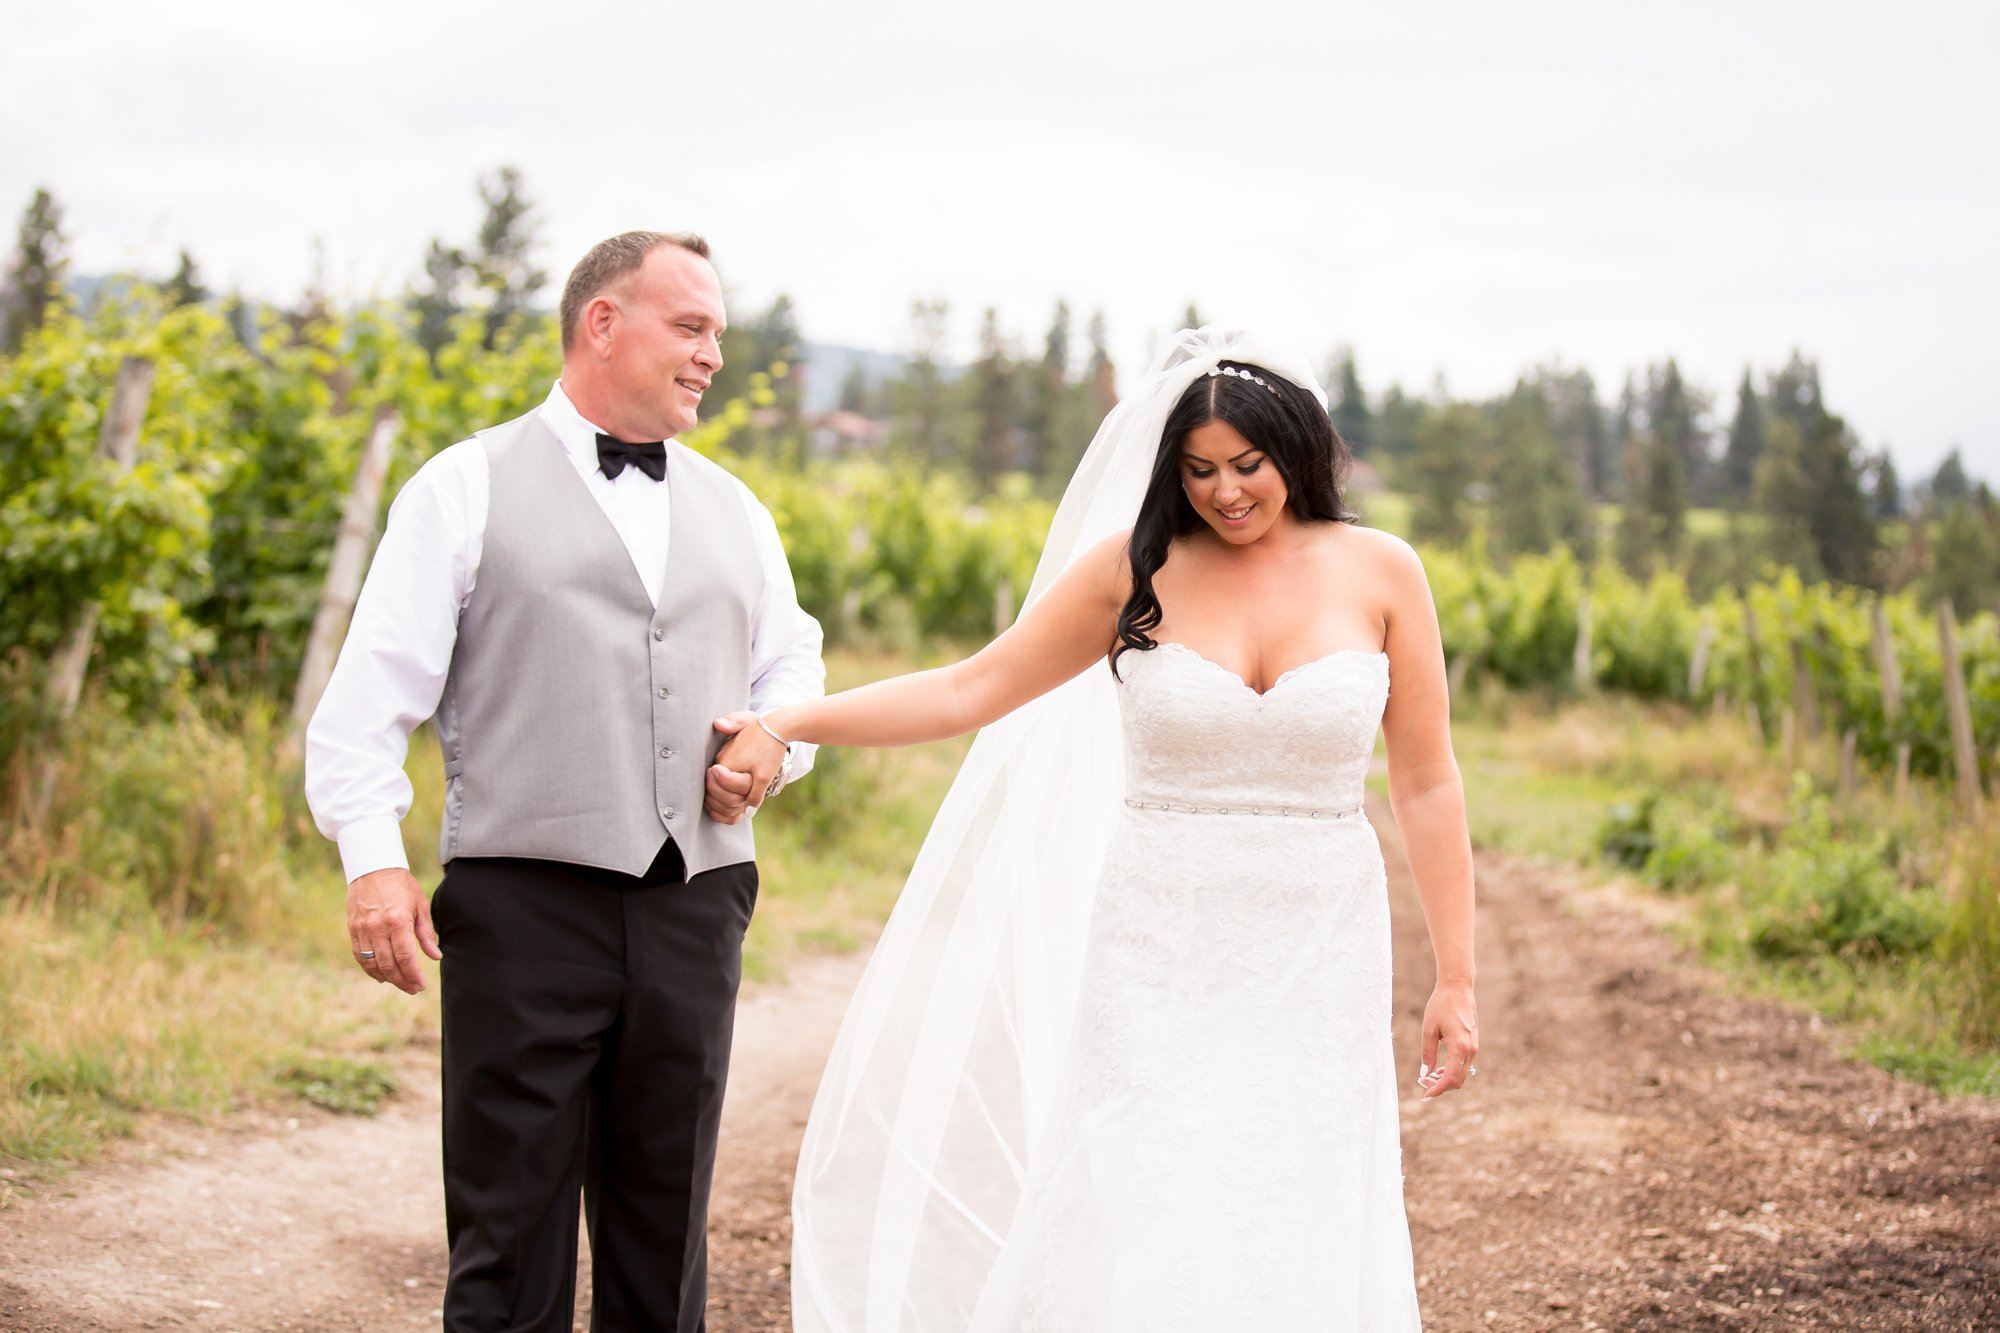 A bride and groom walking through a vineyard